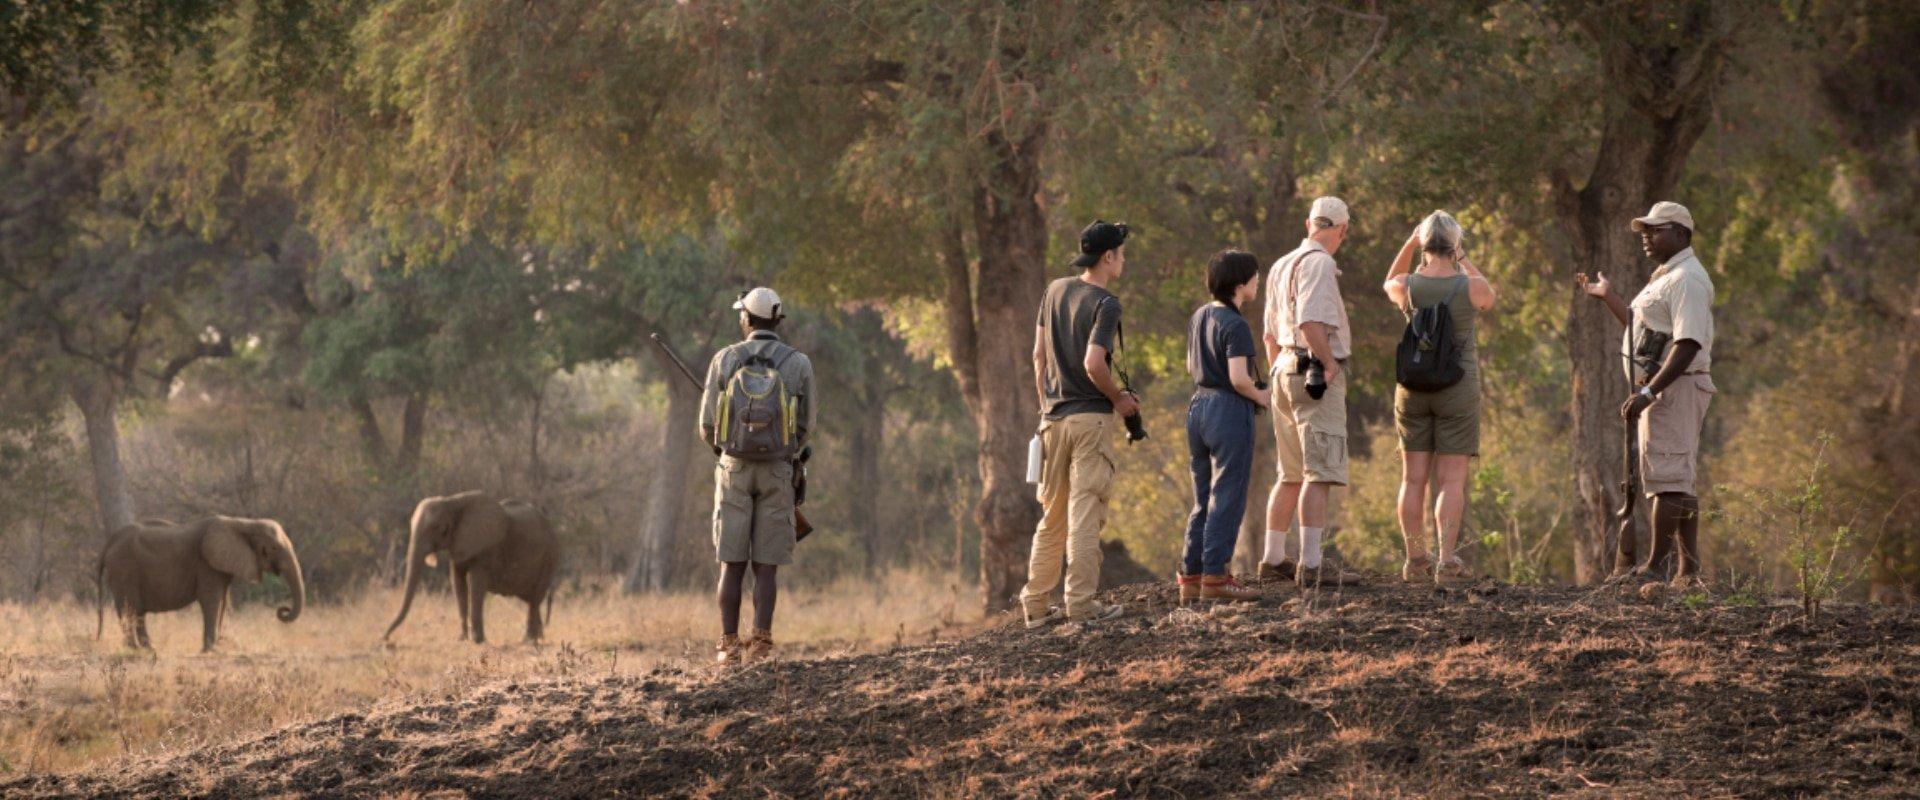 Tread carefully on a walking safari